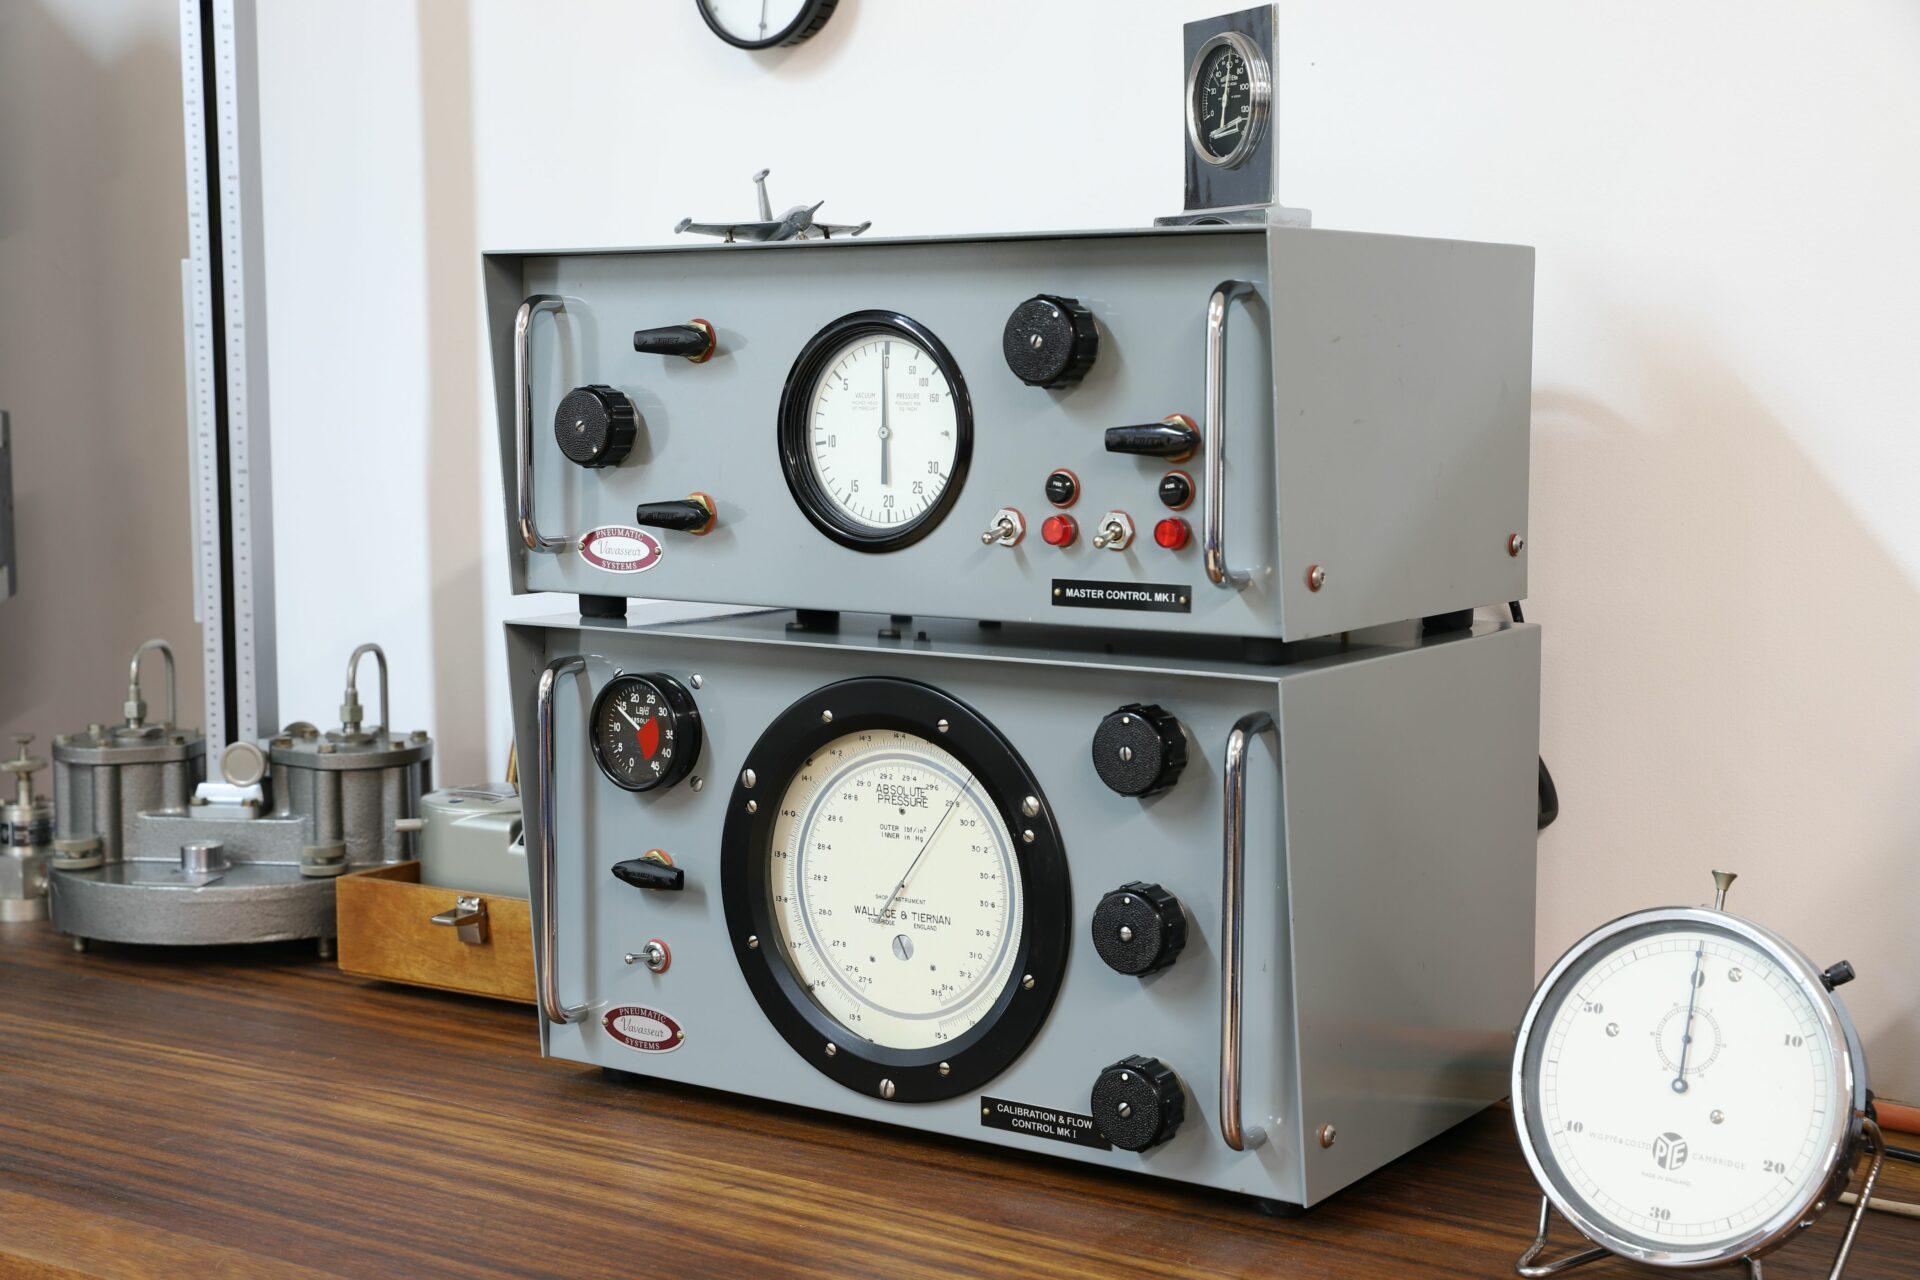 Image of Vavasseur Laboratory Test Equipment calibration units and Negretti & Zambra precision test barometer